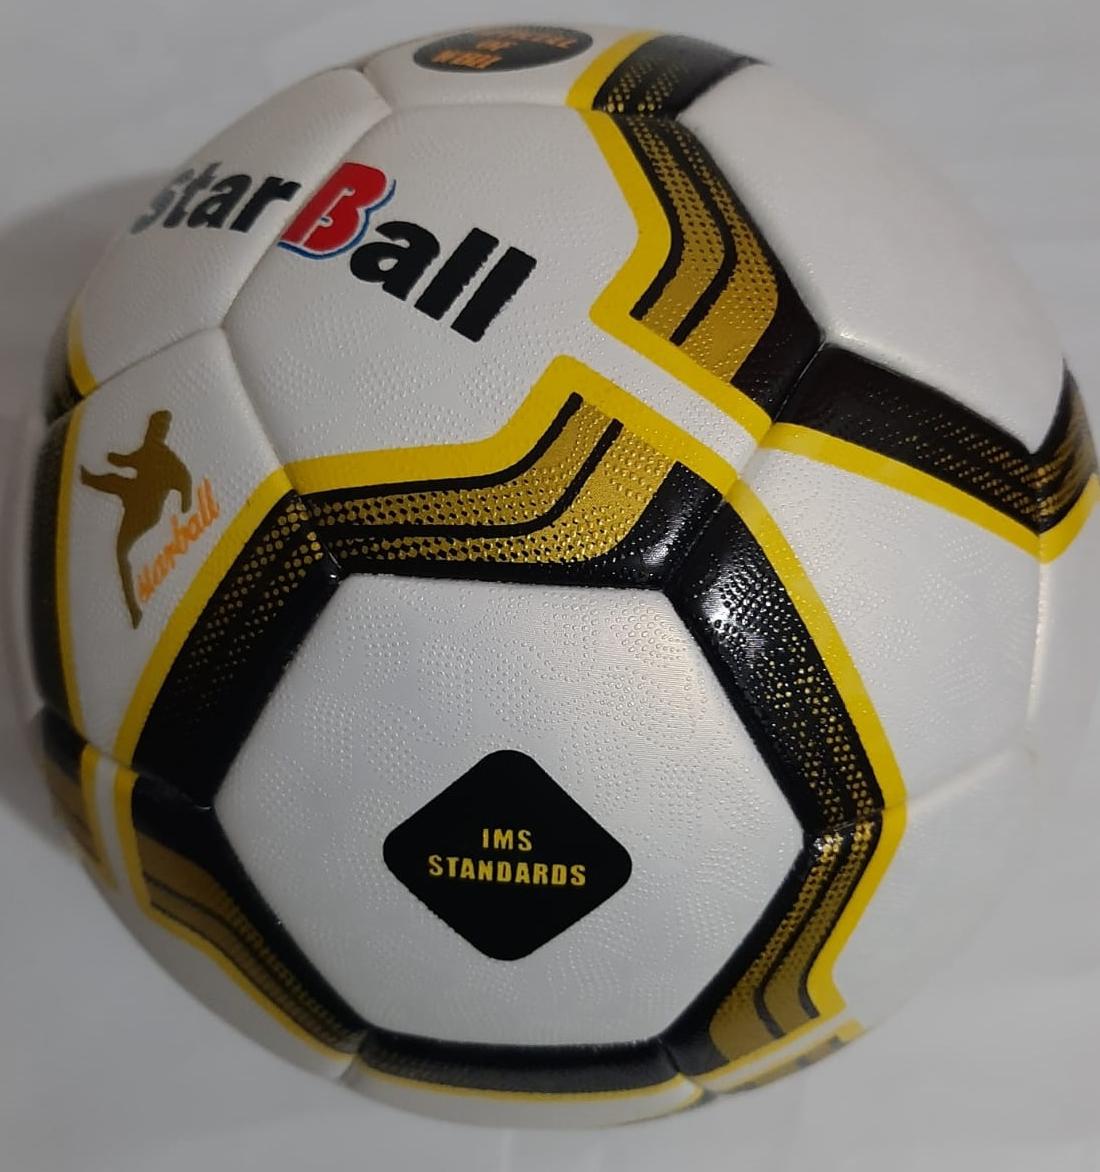 AXION Match- Balón PROFESSIONAL  PU Nª5 IMS